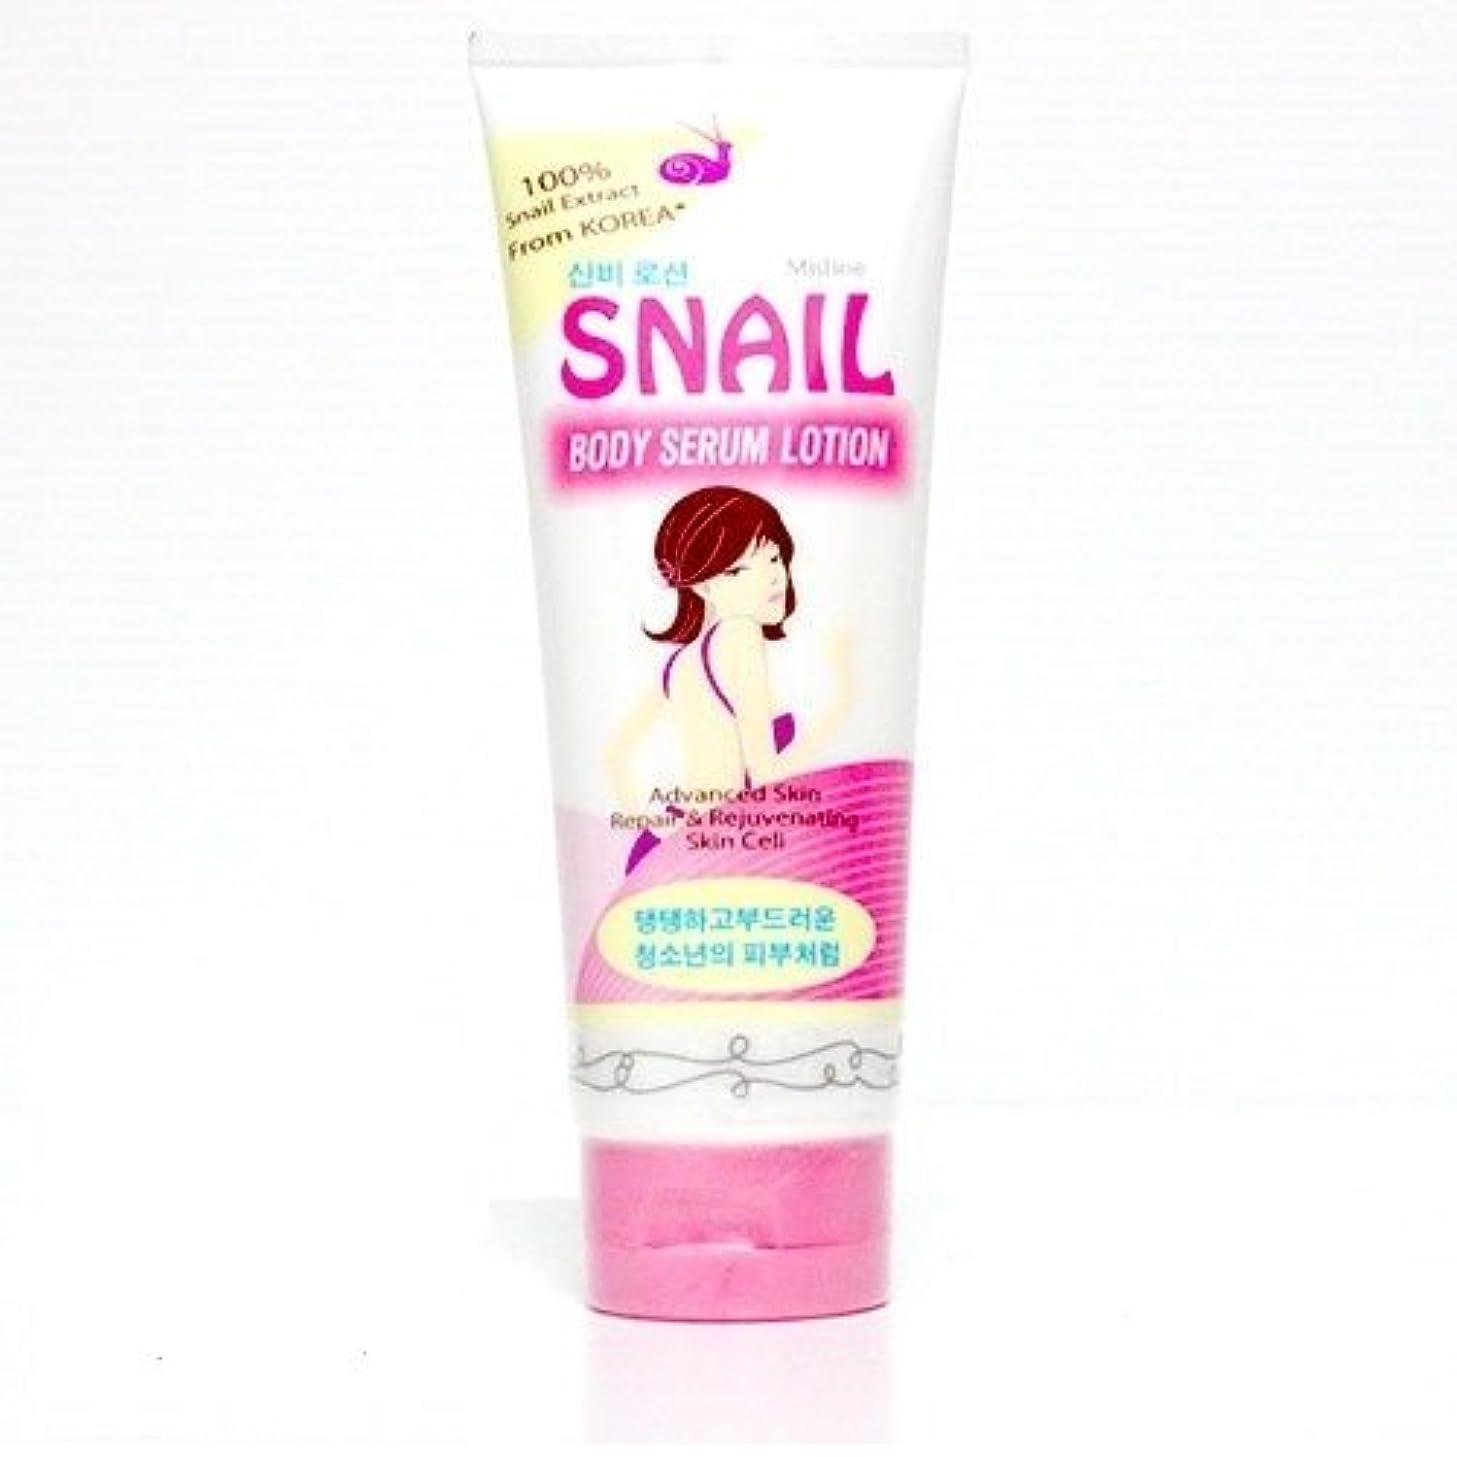 エイズ検索分類Mistine Snail Body Serum Lotion 2 packs by Mistine [並行輸入品]